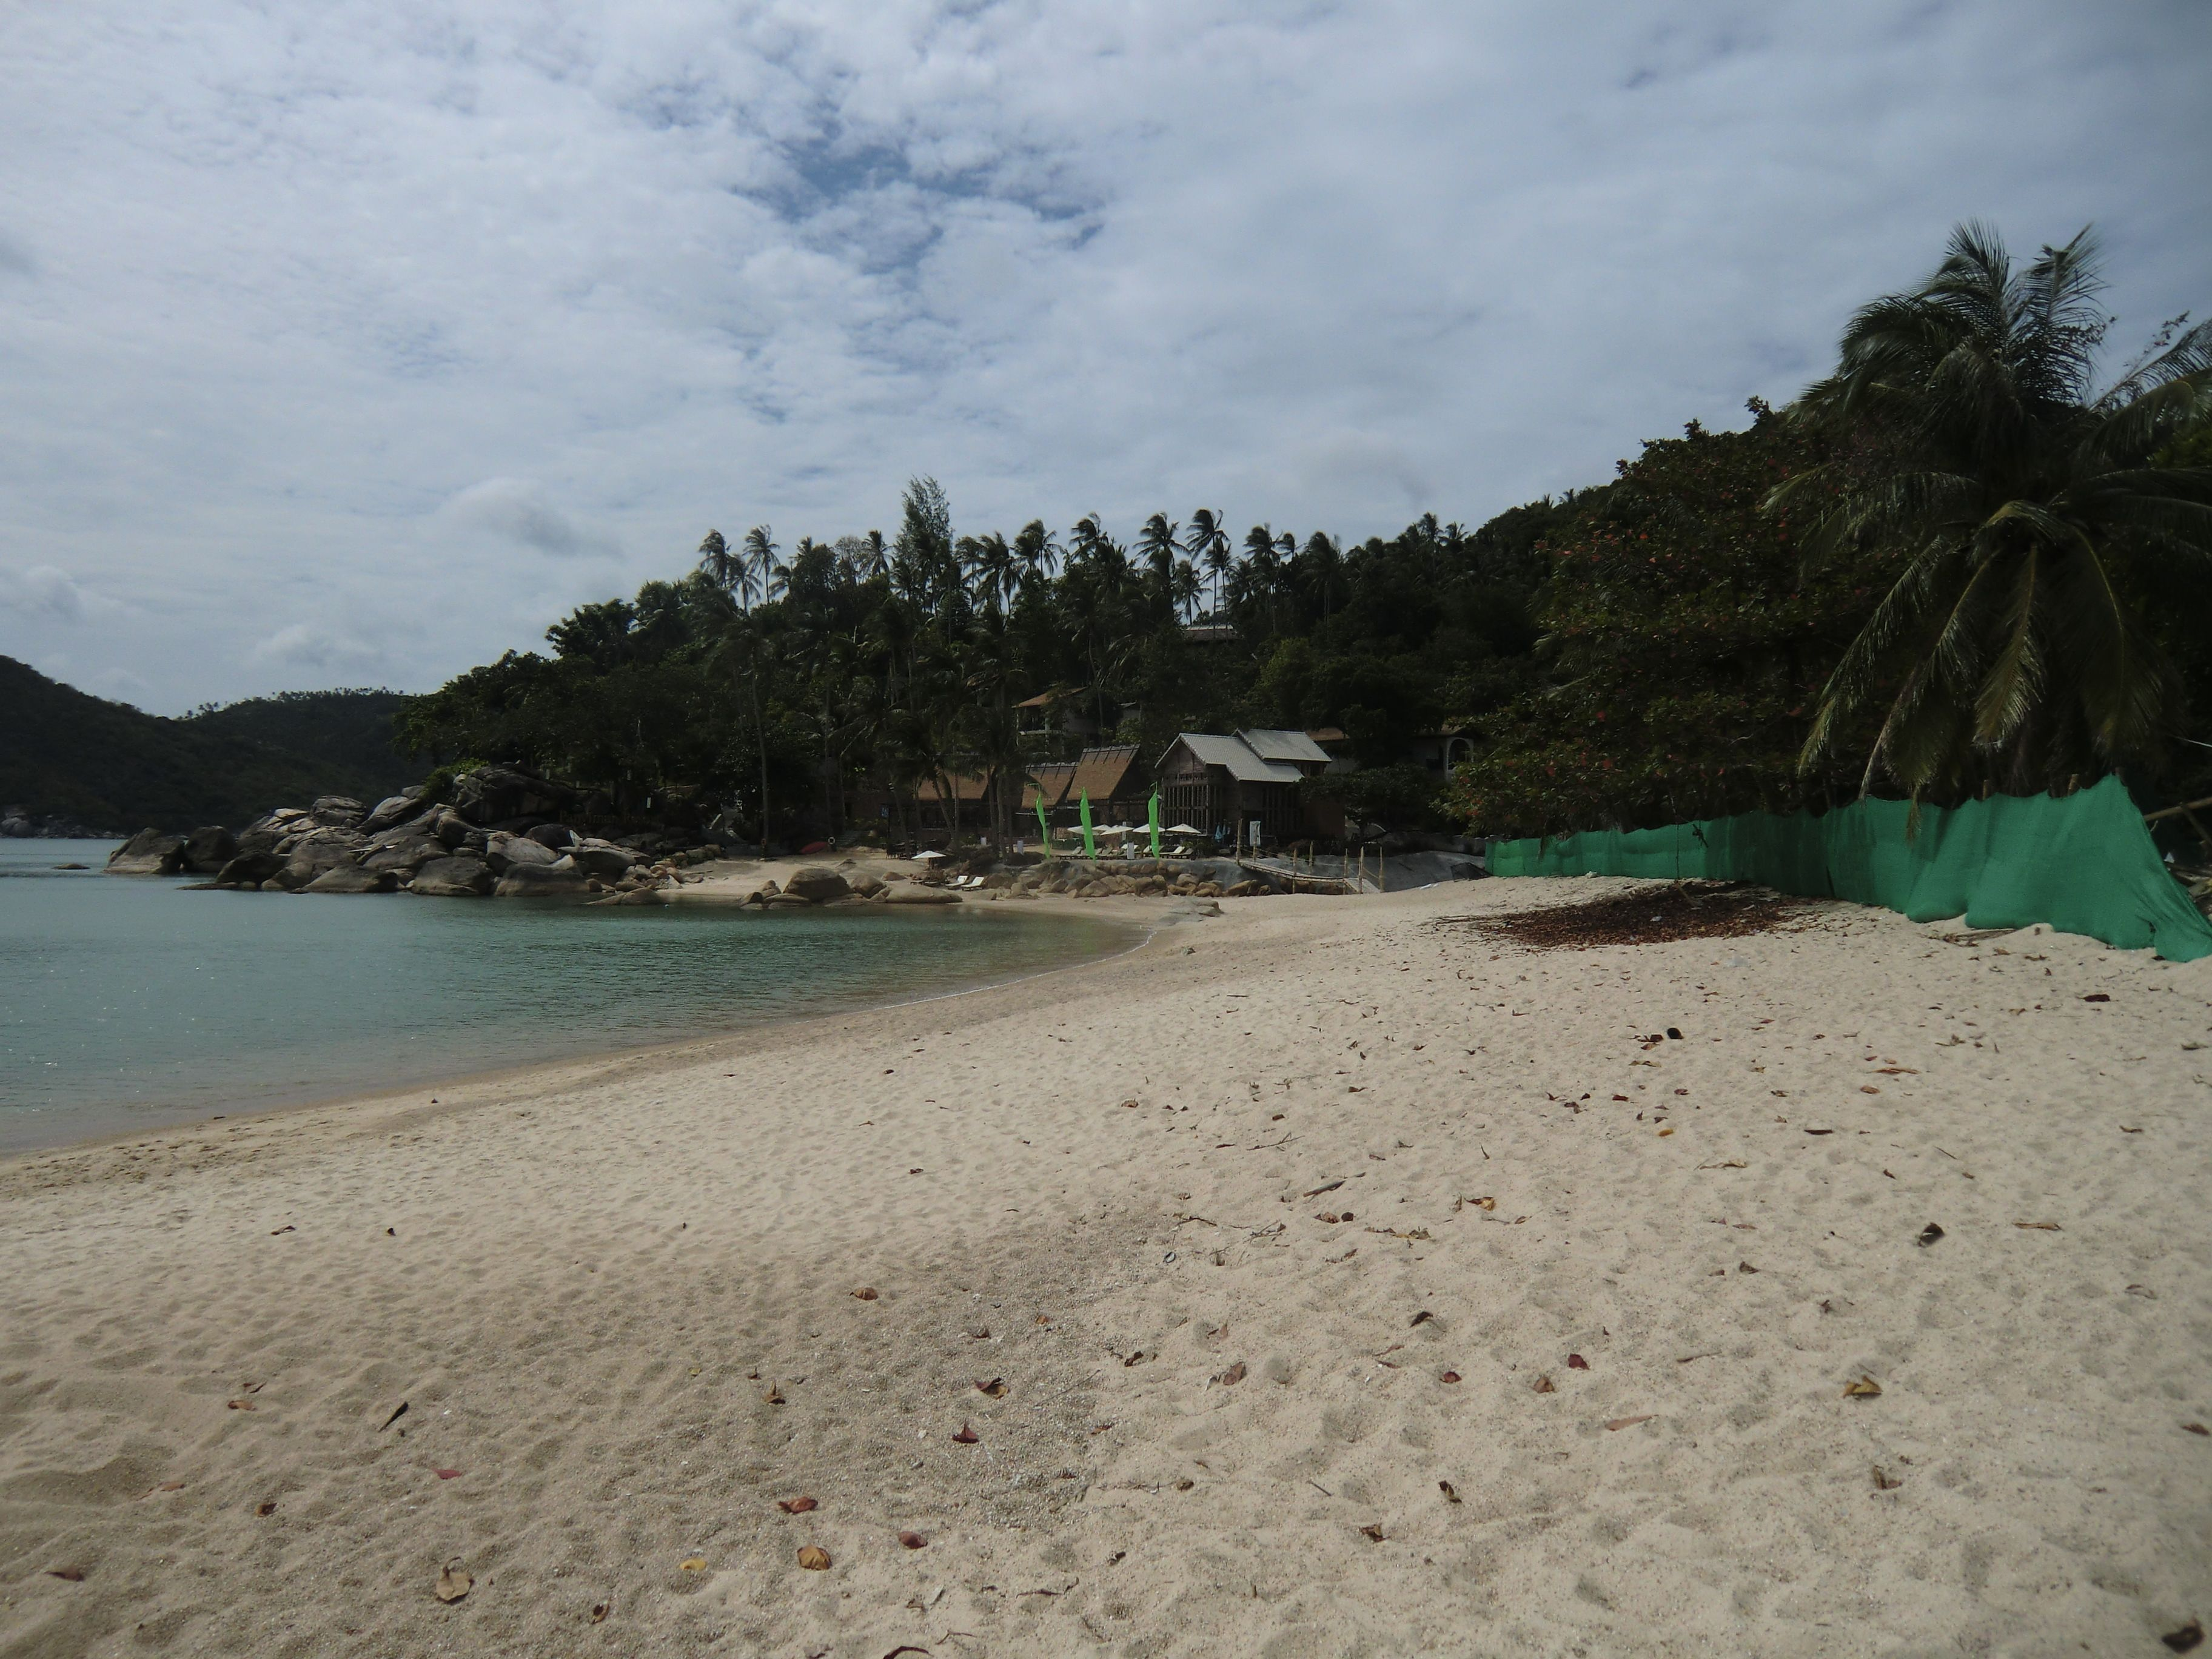 der Strand von Thong Nai Pan Noi rechtsseitig